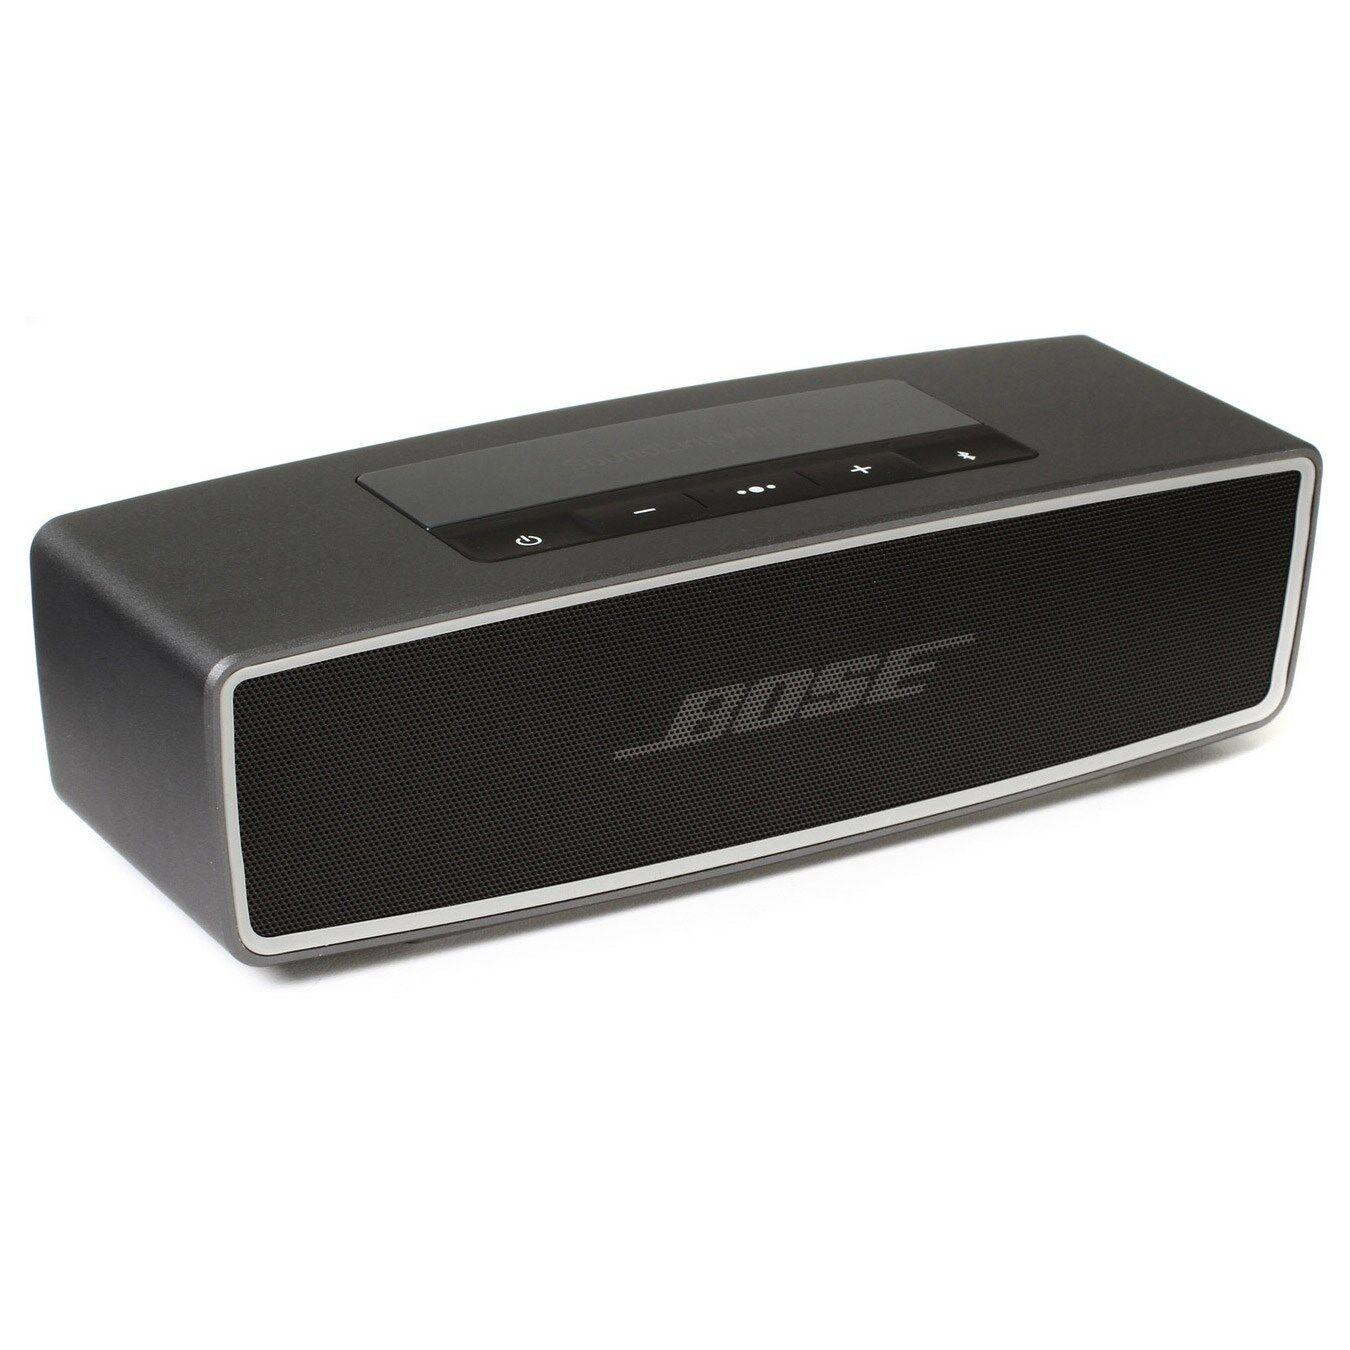 bose soundlink mini ii bluetooth wireless speaker carbon new ebay. Black Bedroom Furniture Sets. Home Design Ideas